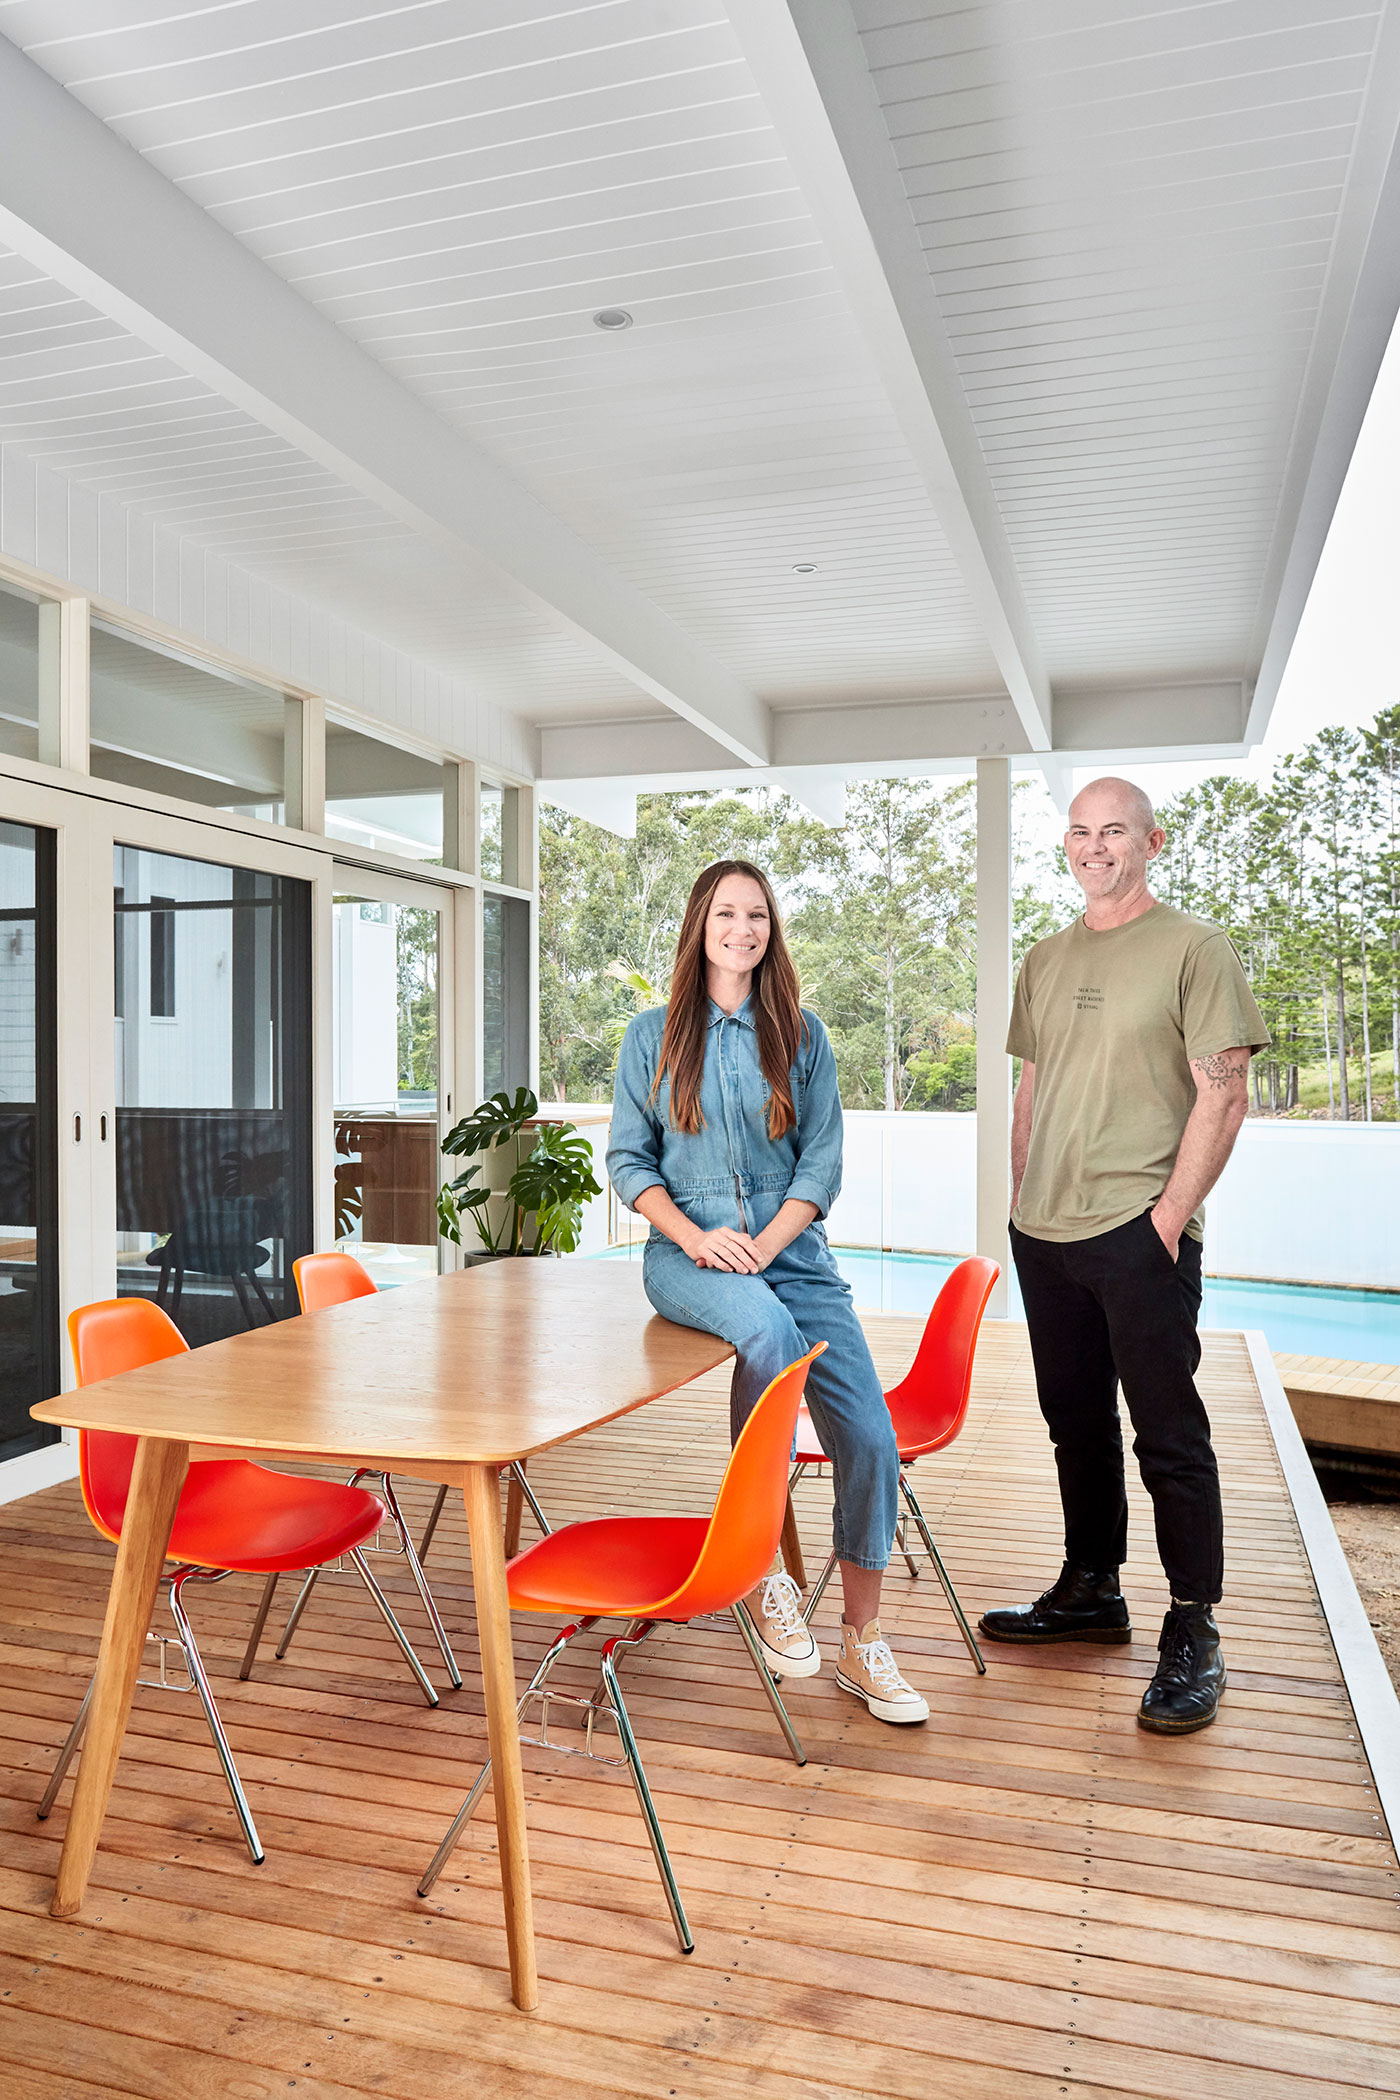 GRAND DESIGNS AUSTRALIA SERIES 8 HOST & HOME OWNER PORTRAITS 7